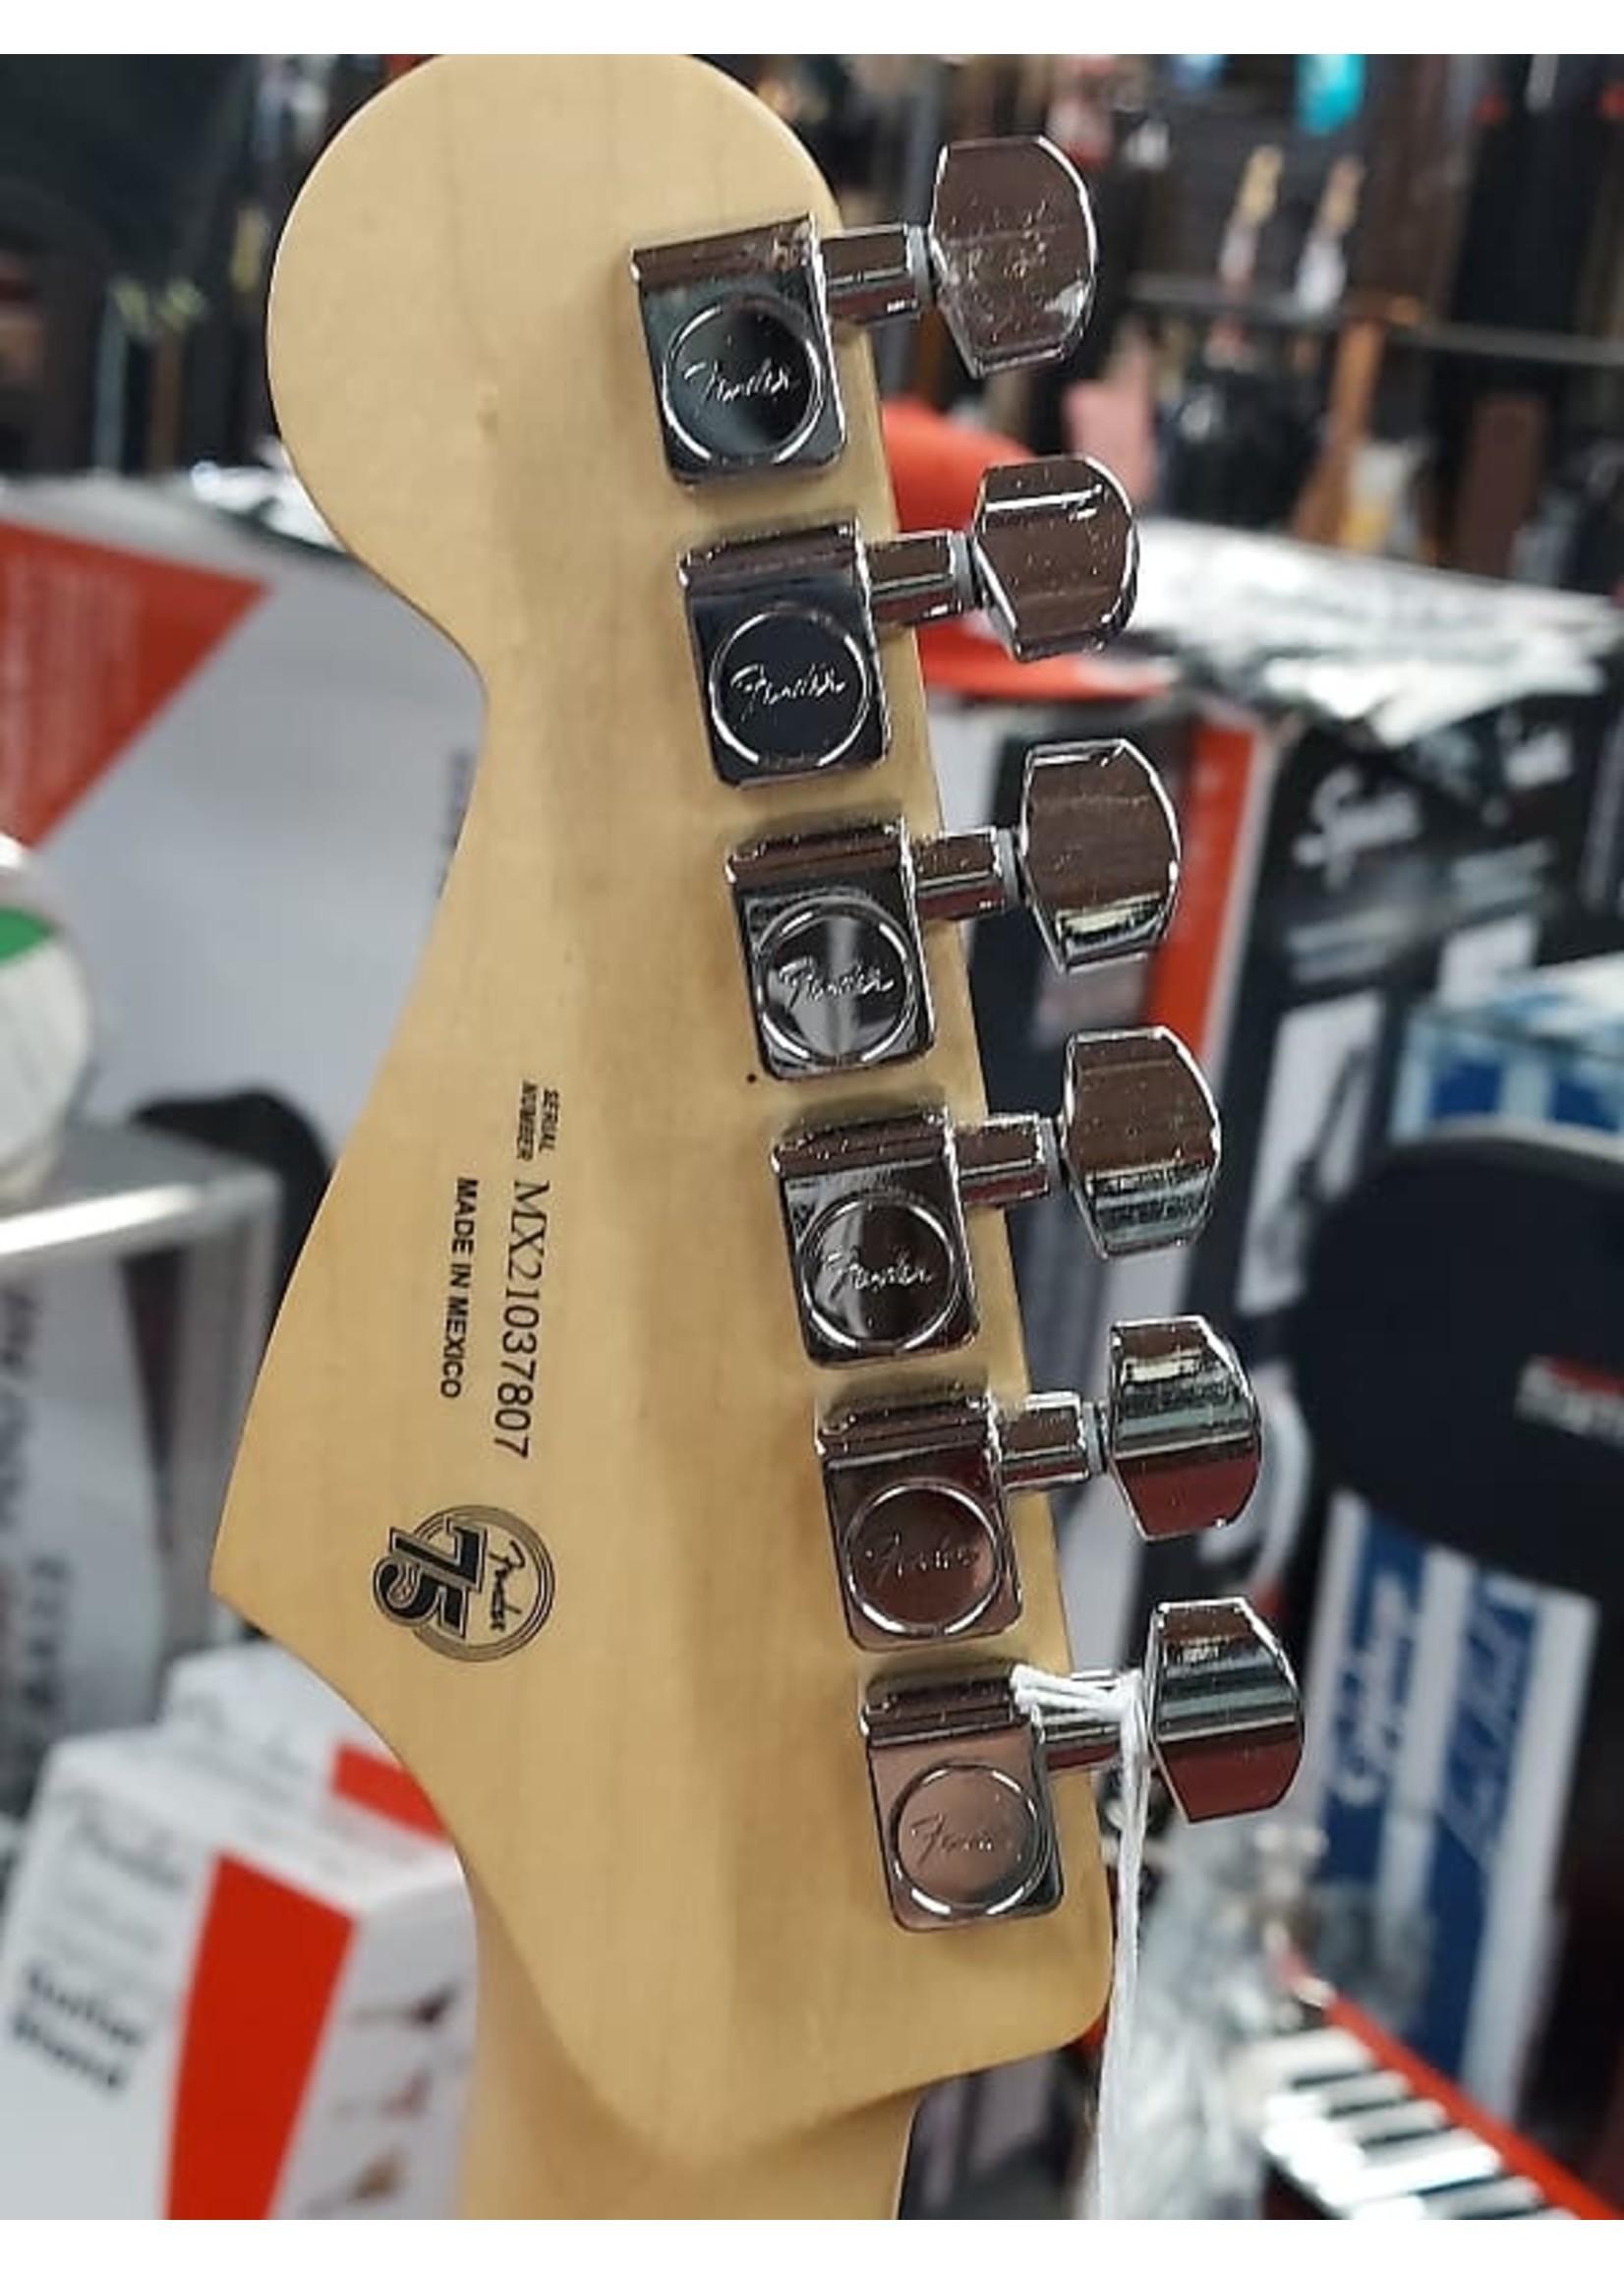 Fender Fender Player Stratocaster® Plus Top, Maple Fingerboard, Aged Cherry Burst